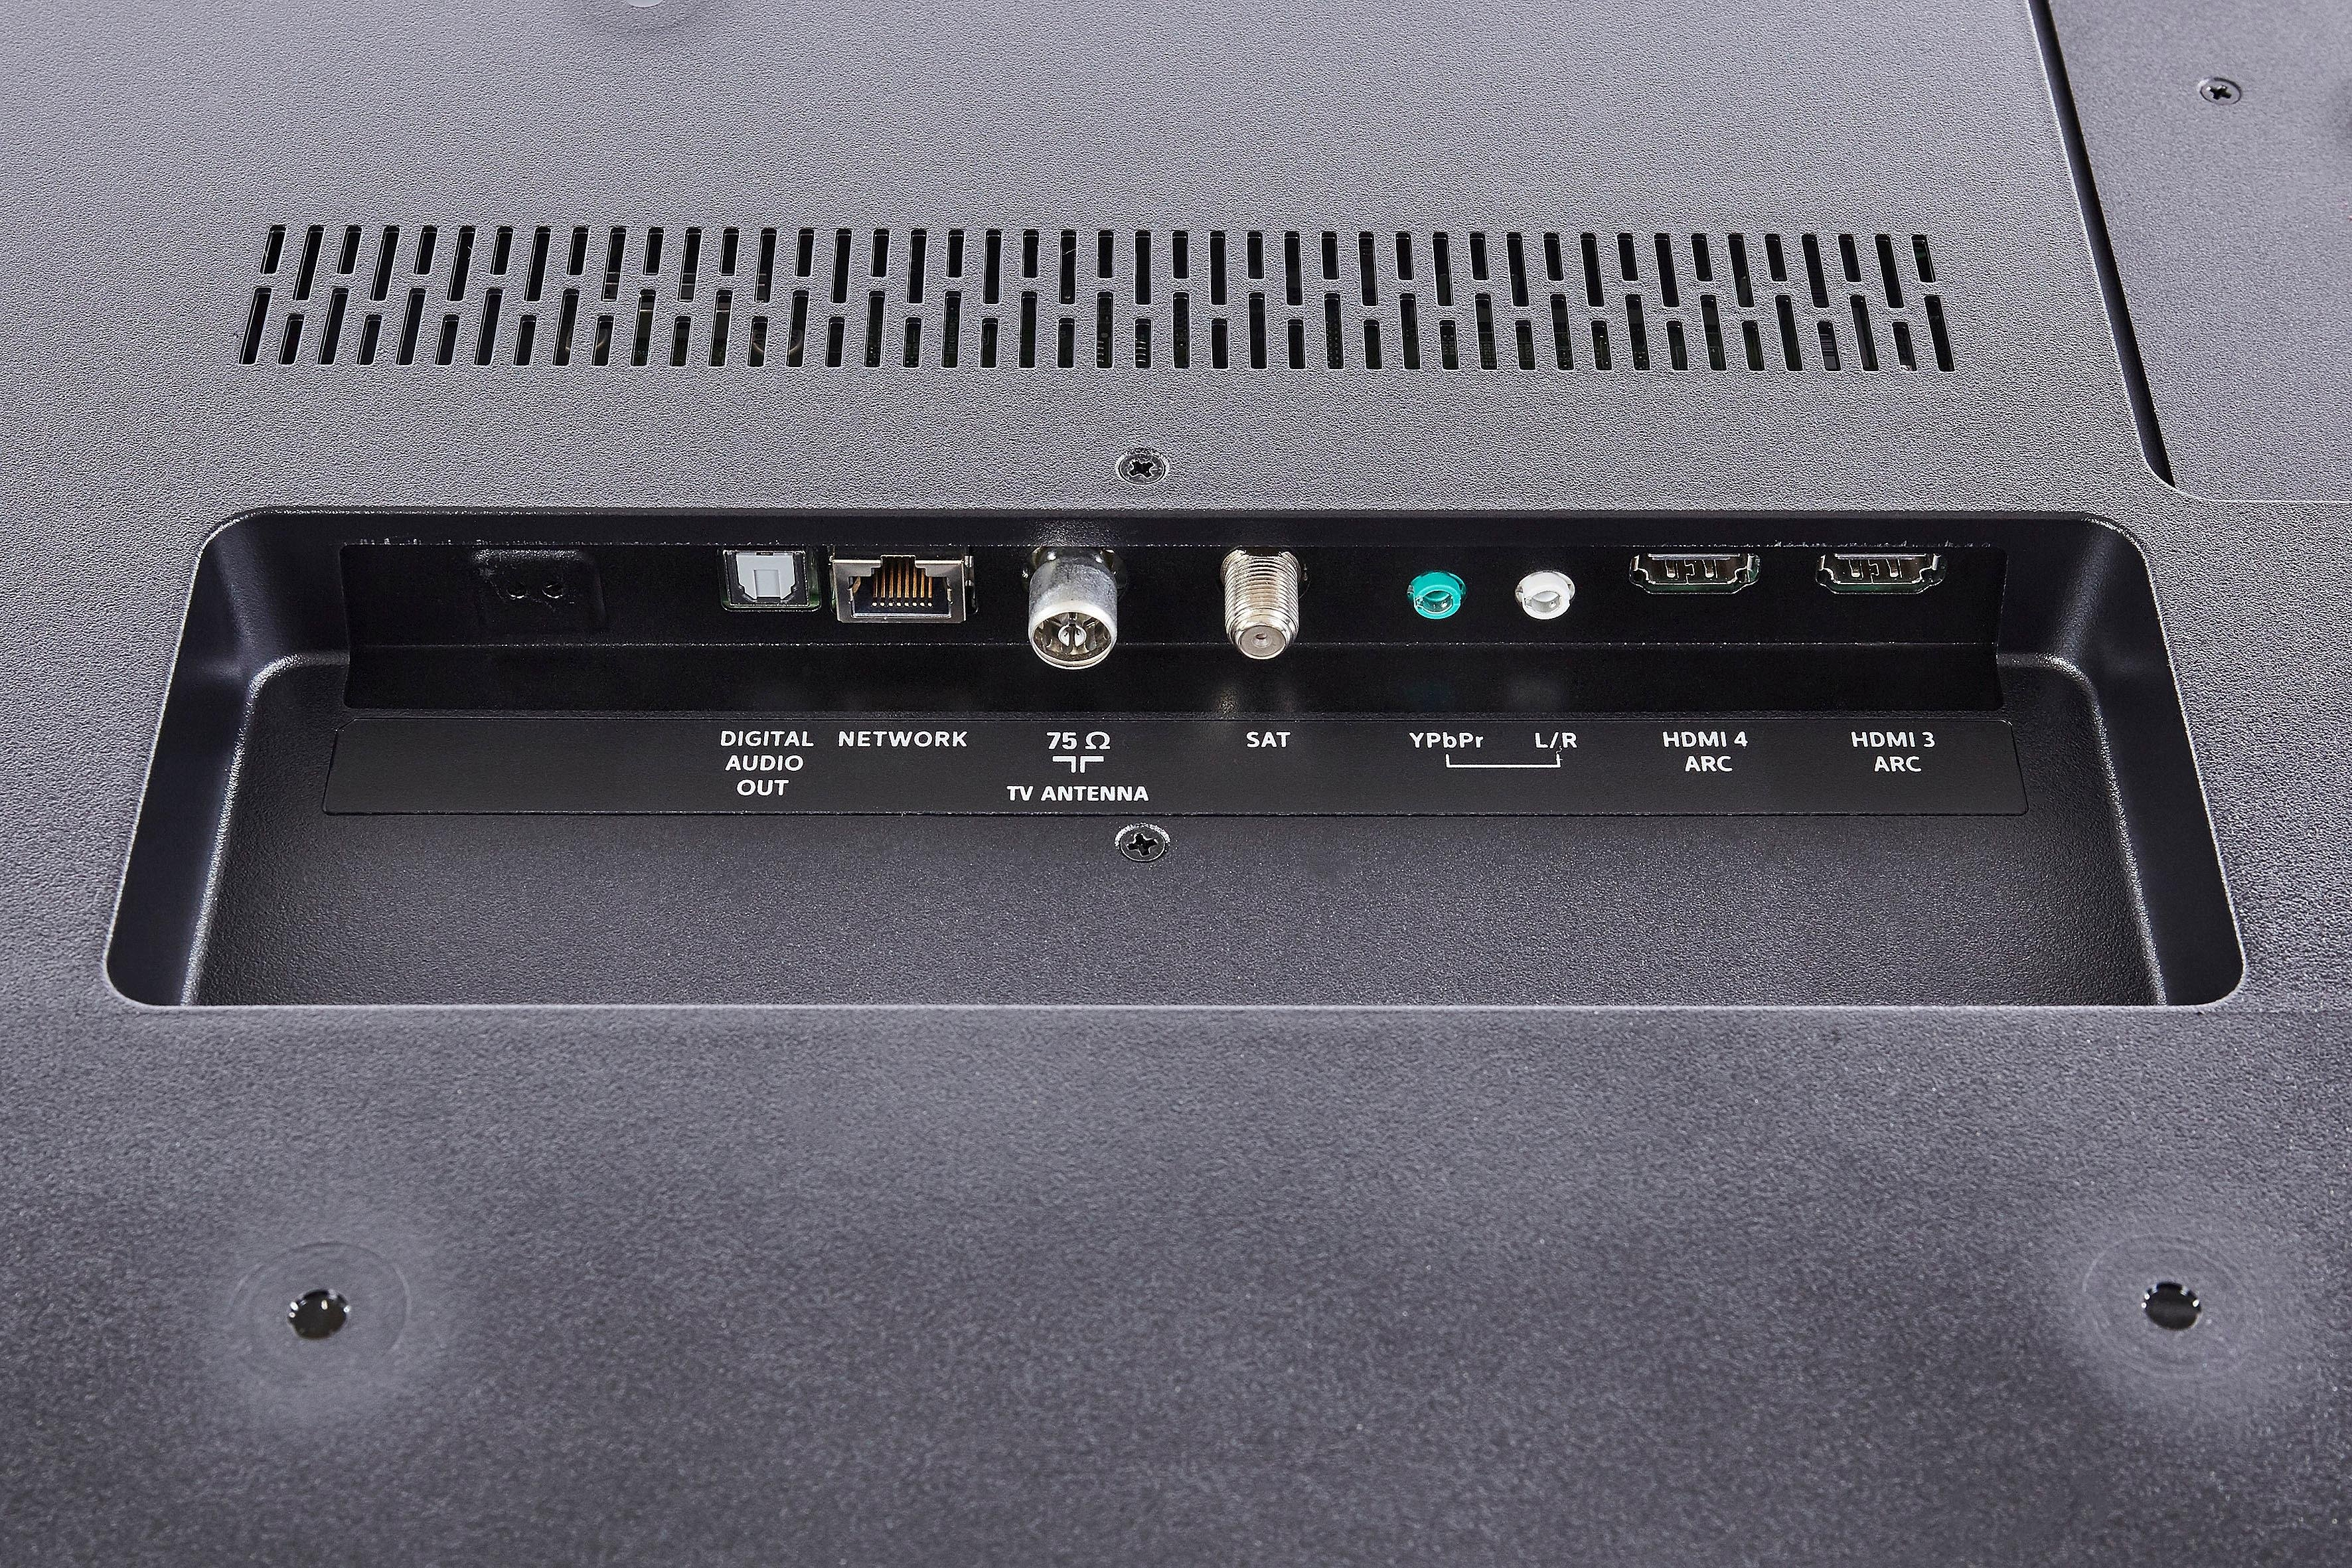 philips 49pus7503 led tv 123 cm 49 inch 4k ultra hd online shop otto. Black Bedroom Furniture Sets. Home Design Ideas